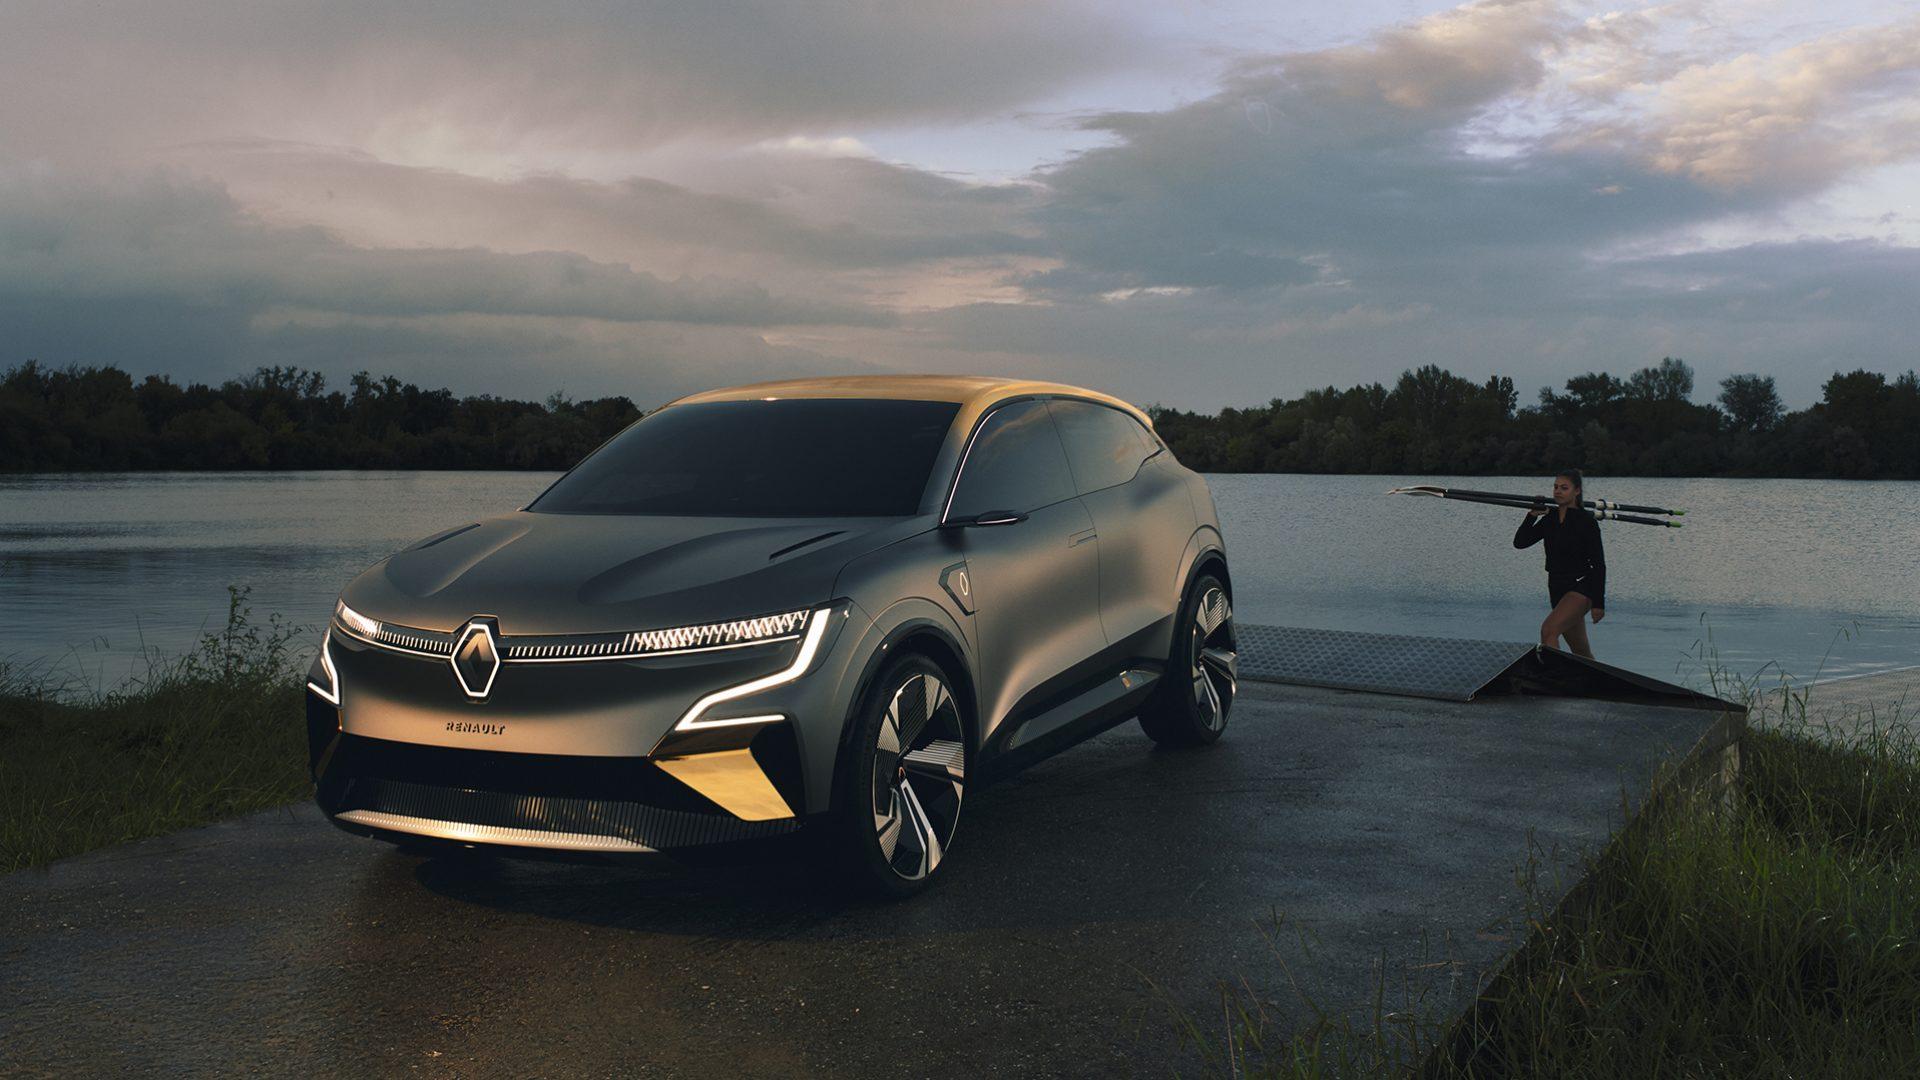 2020-Renault-Megane-eVision-Concept-11